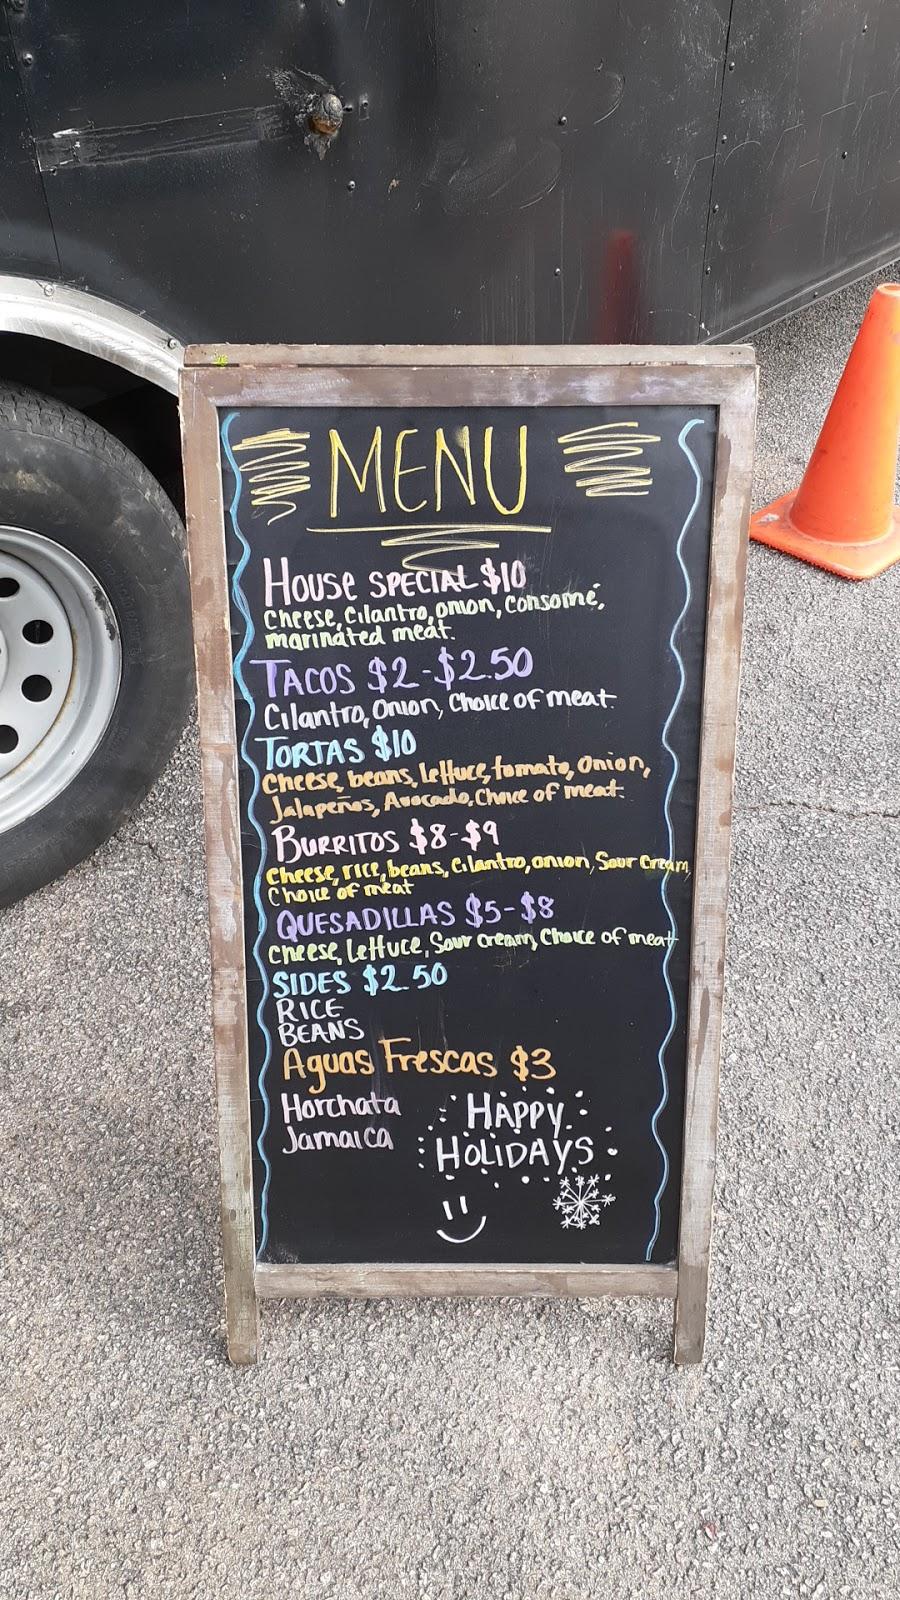 TAQUERIA EL GAVILAN D.F. | restaurant | 215 Davidson Hwy, Concord, NC 28027, USA | 7042306330 OR +1 704-230-6330